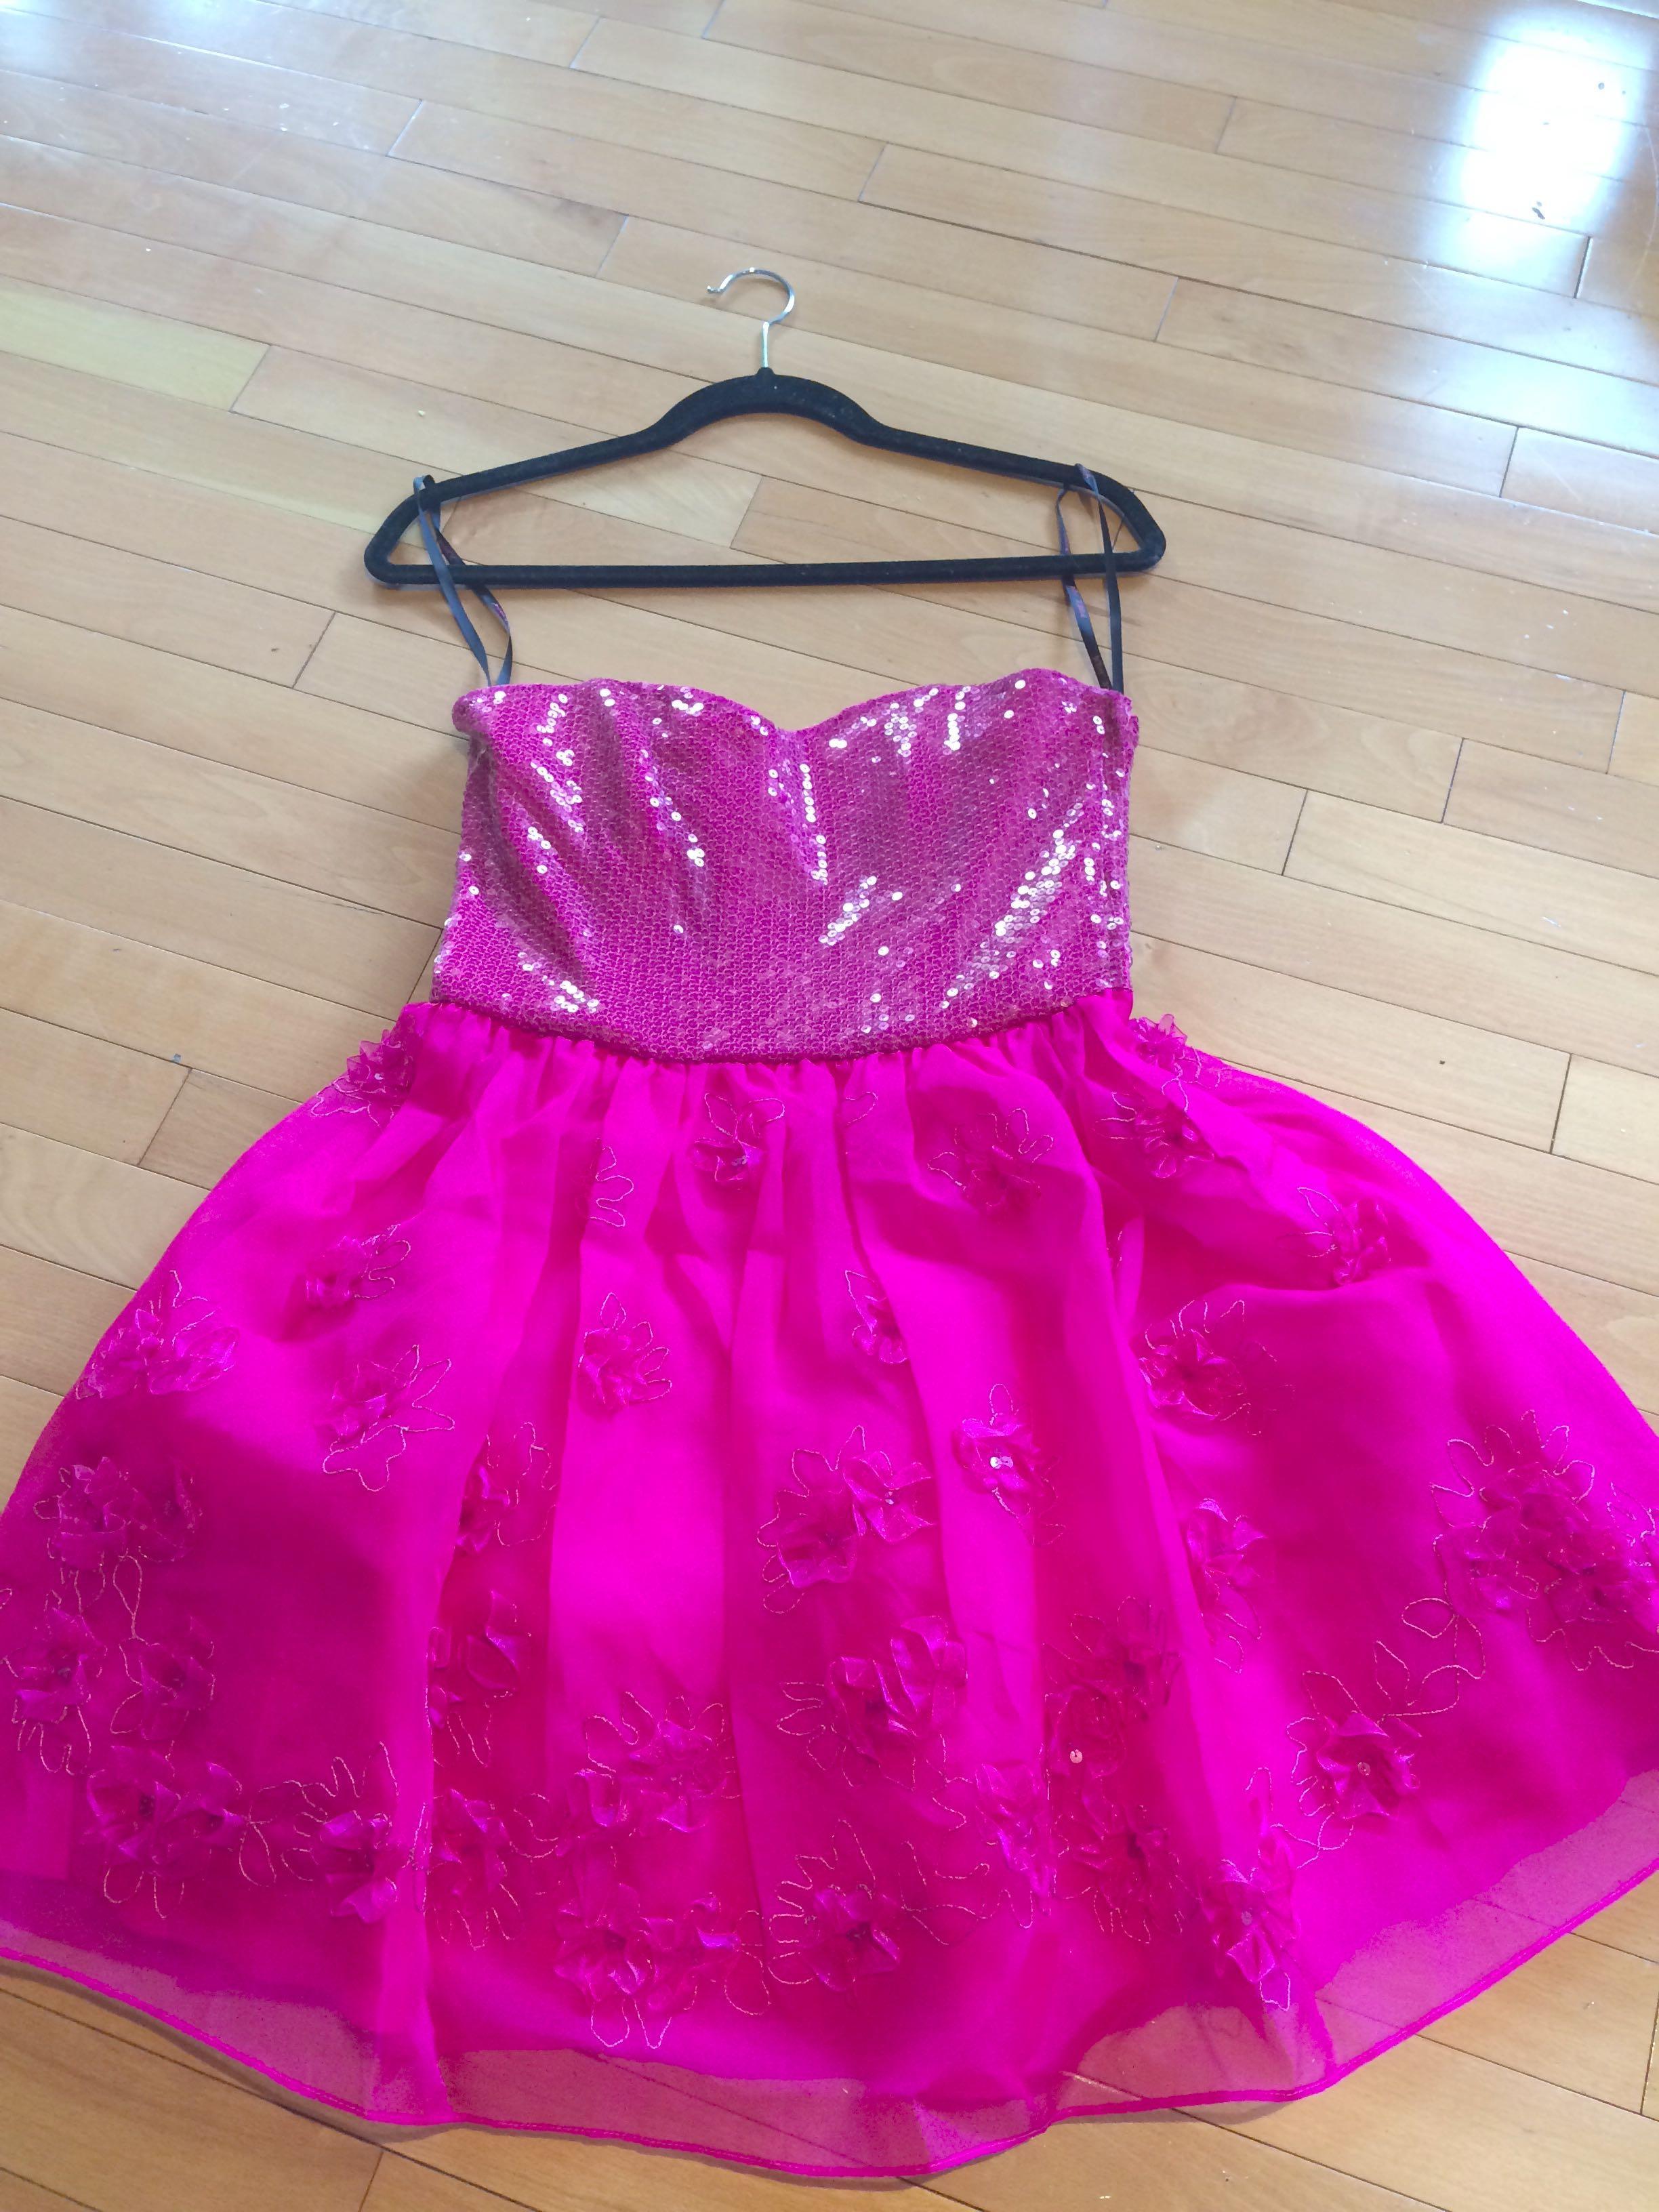 Betsey Johnson size 8, original party dress, worn once